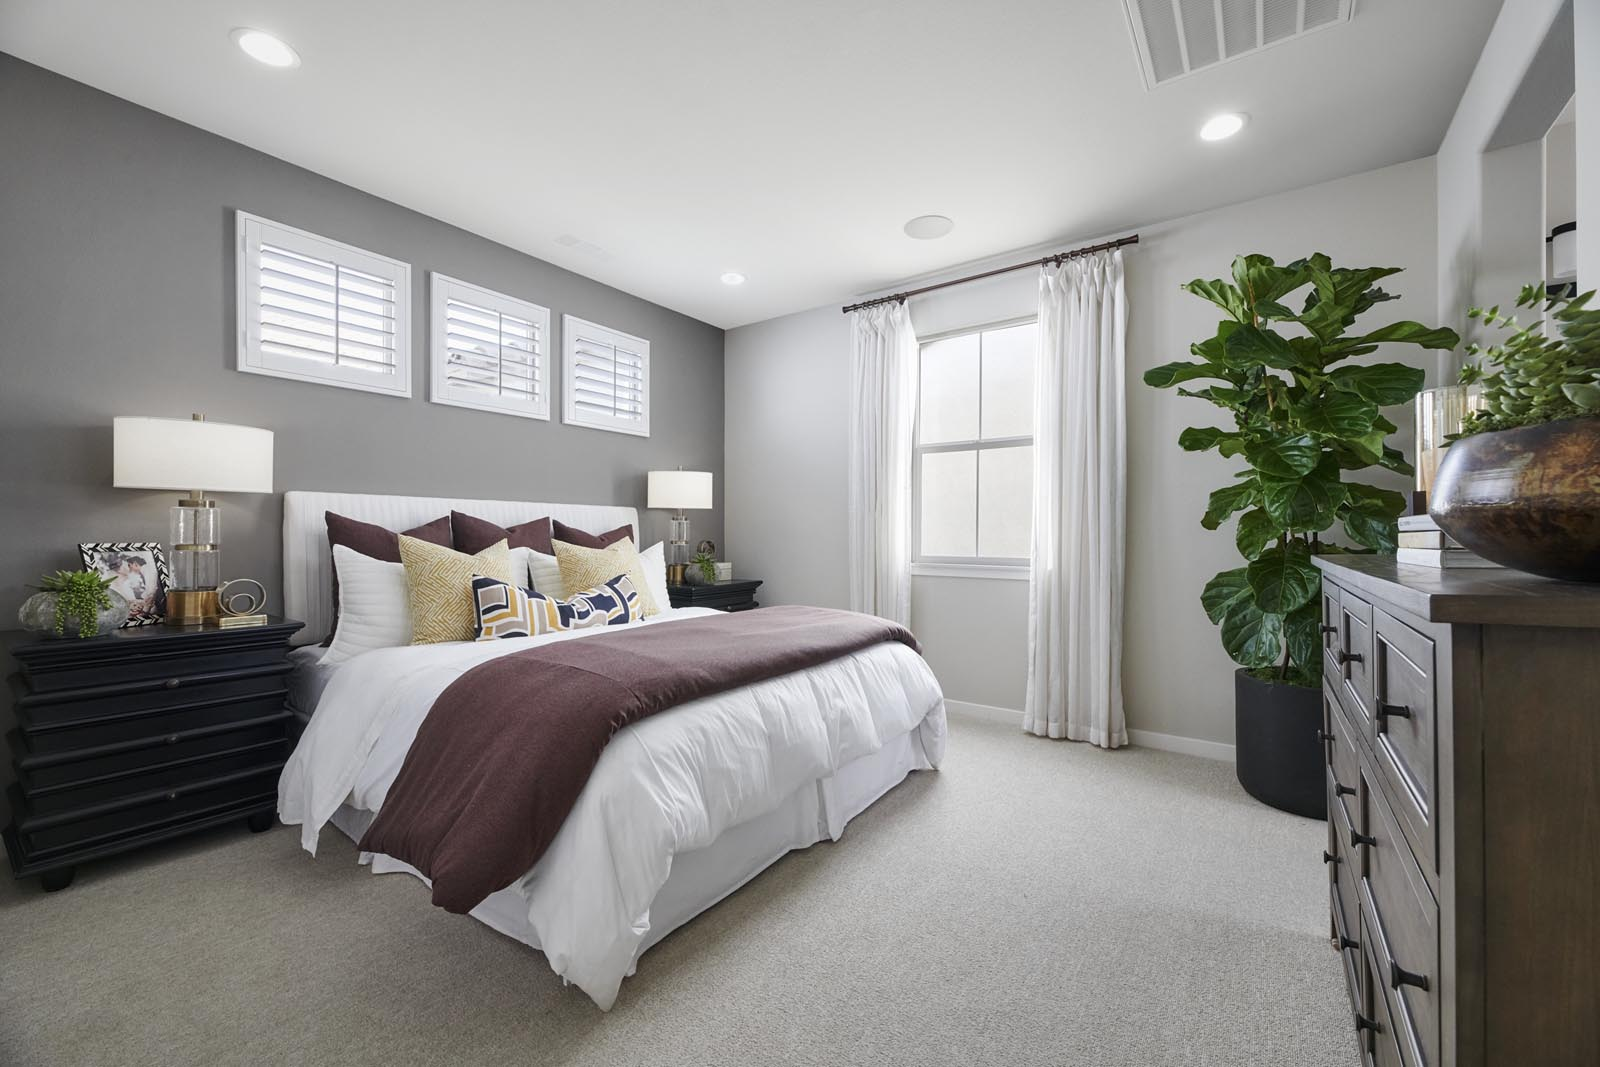 Master Bedroom | Residence 2 | Lumin | New Homes in Rancho Cucamonga, CA | Van Daele Homes